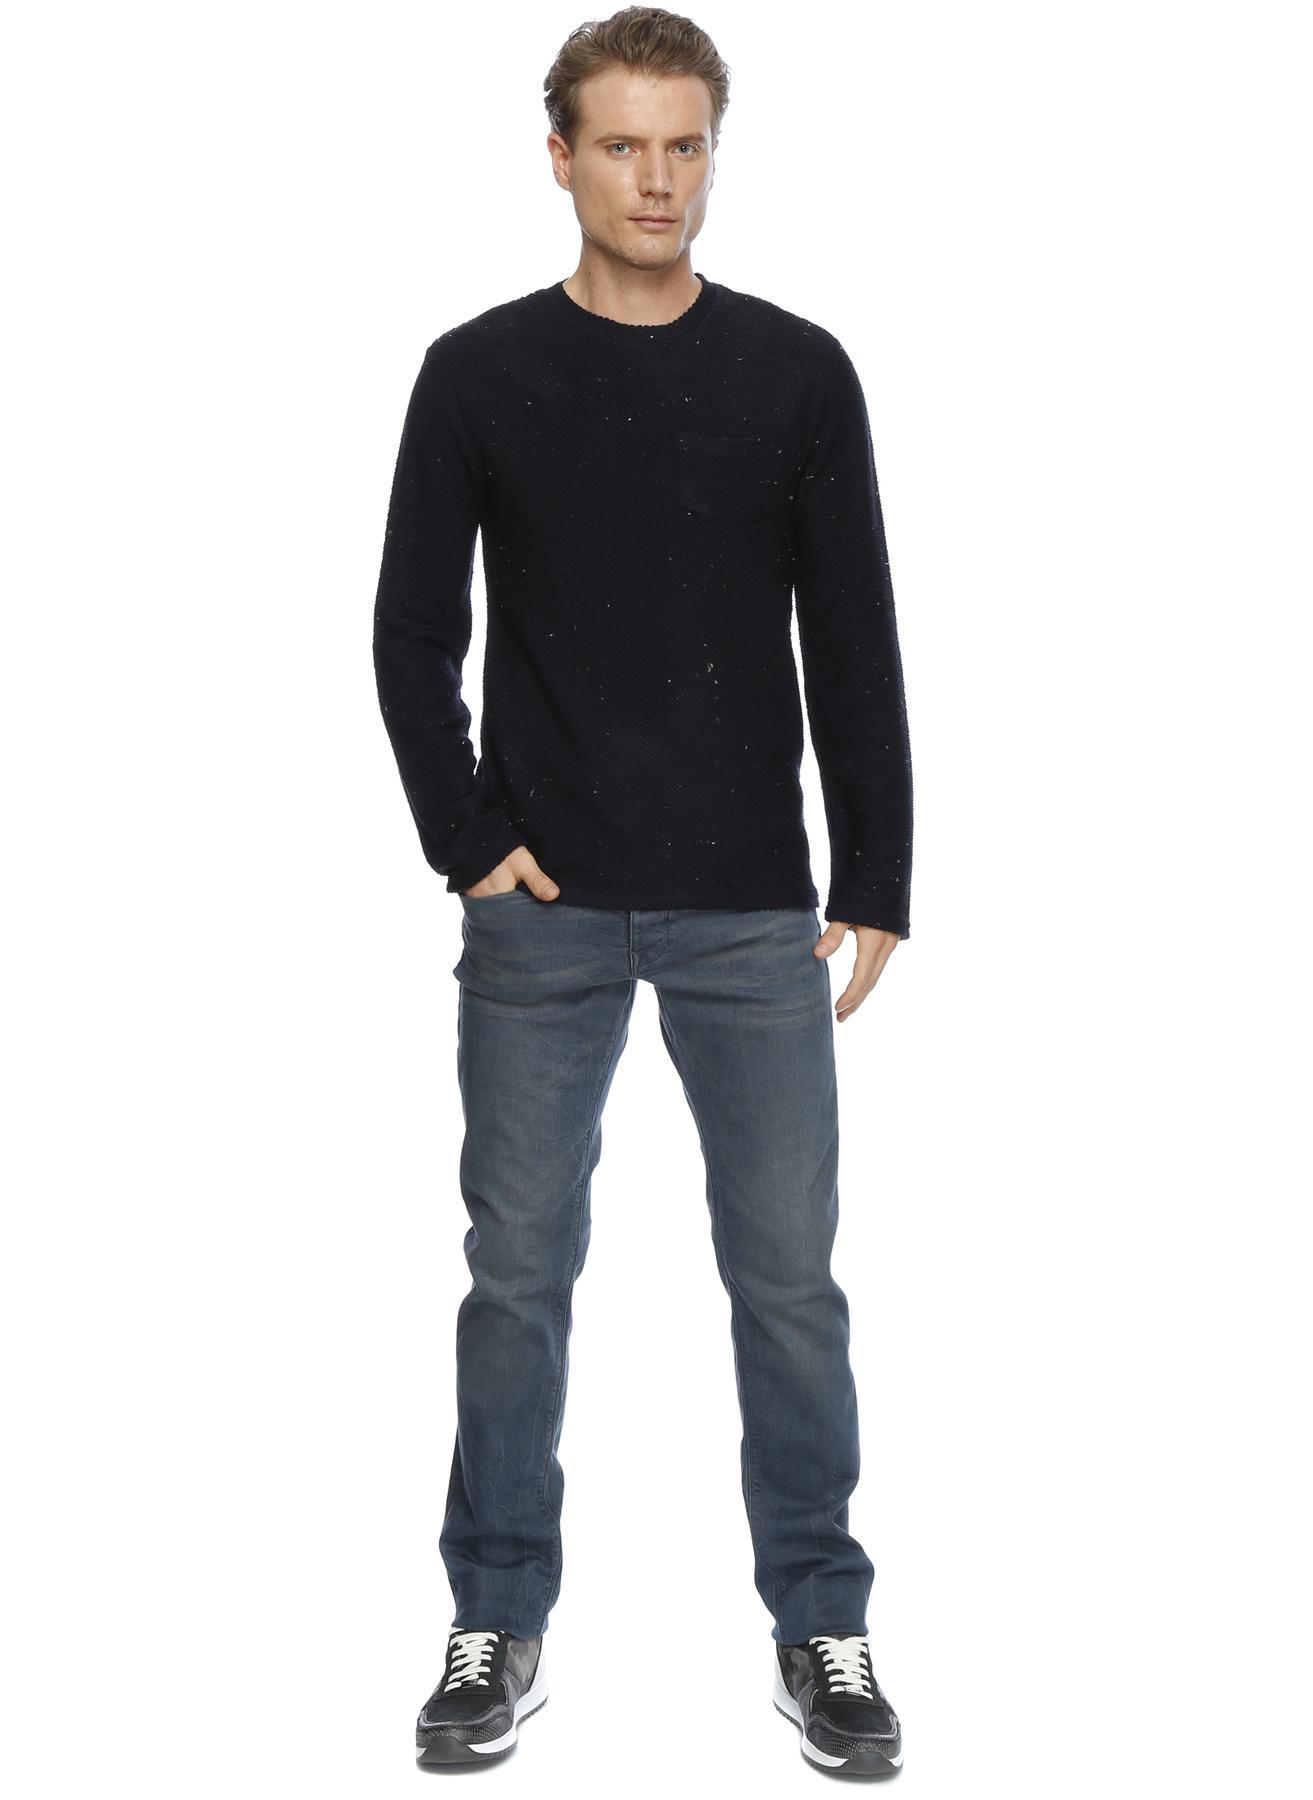 Loft Outstanding Stil Klasik Pantolon 32-34 5000190198009 Ürün Resmi